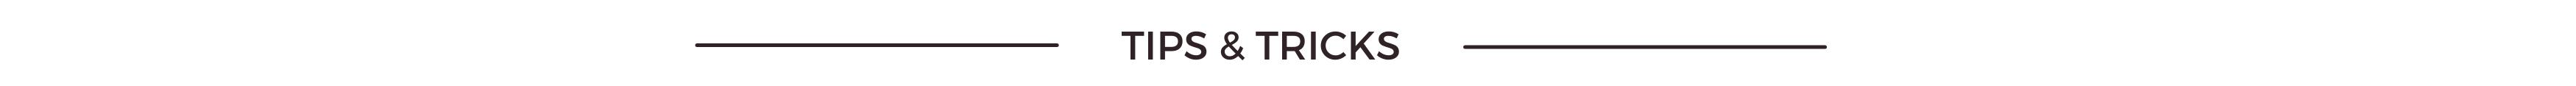 baner matematyczne tips and tricks